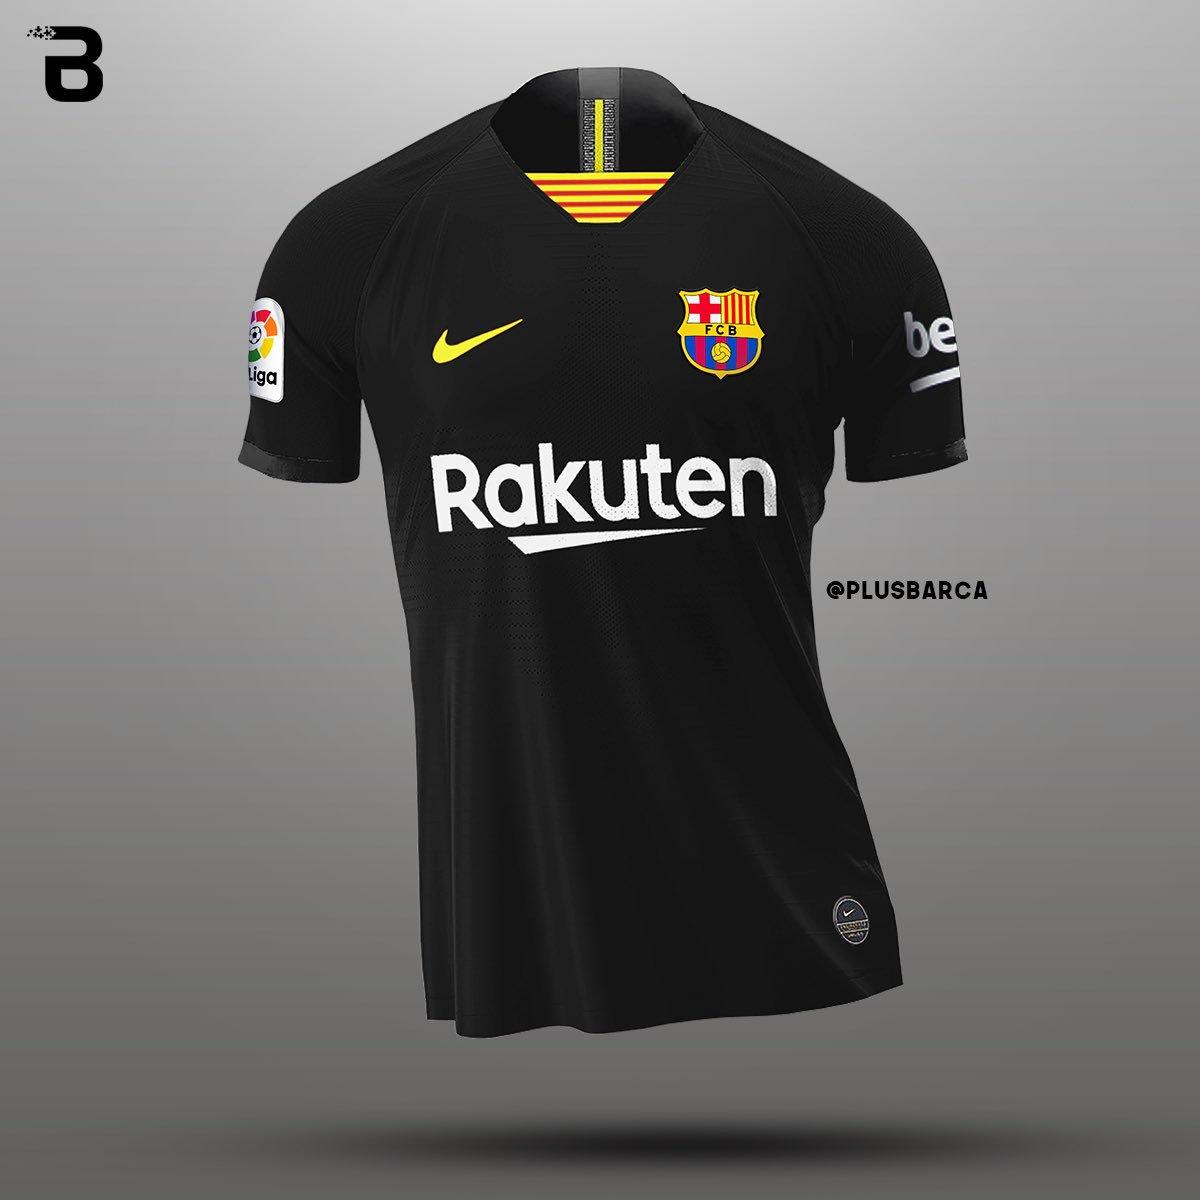 barca on twitter fc barcelona away kit 2020 21 do you like it footyheadlines fc barcelona away kit 2020